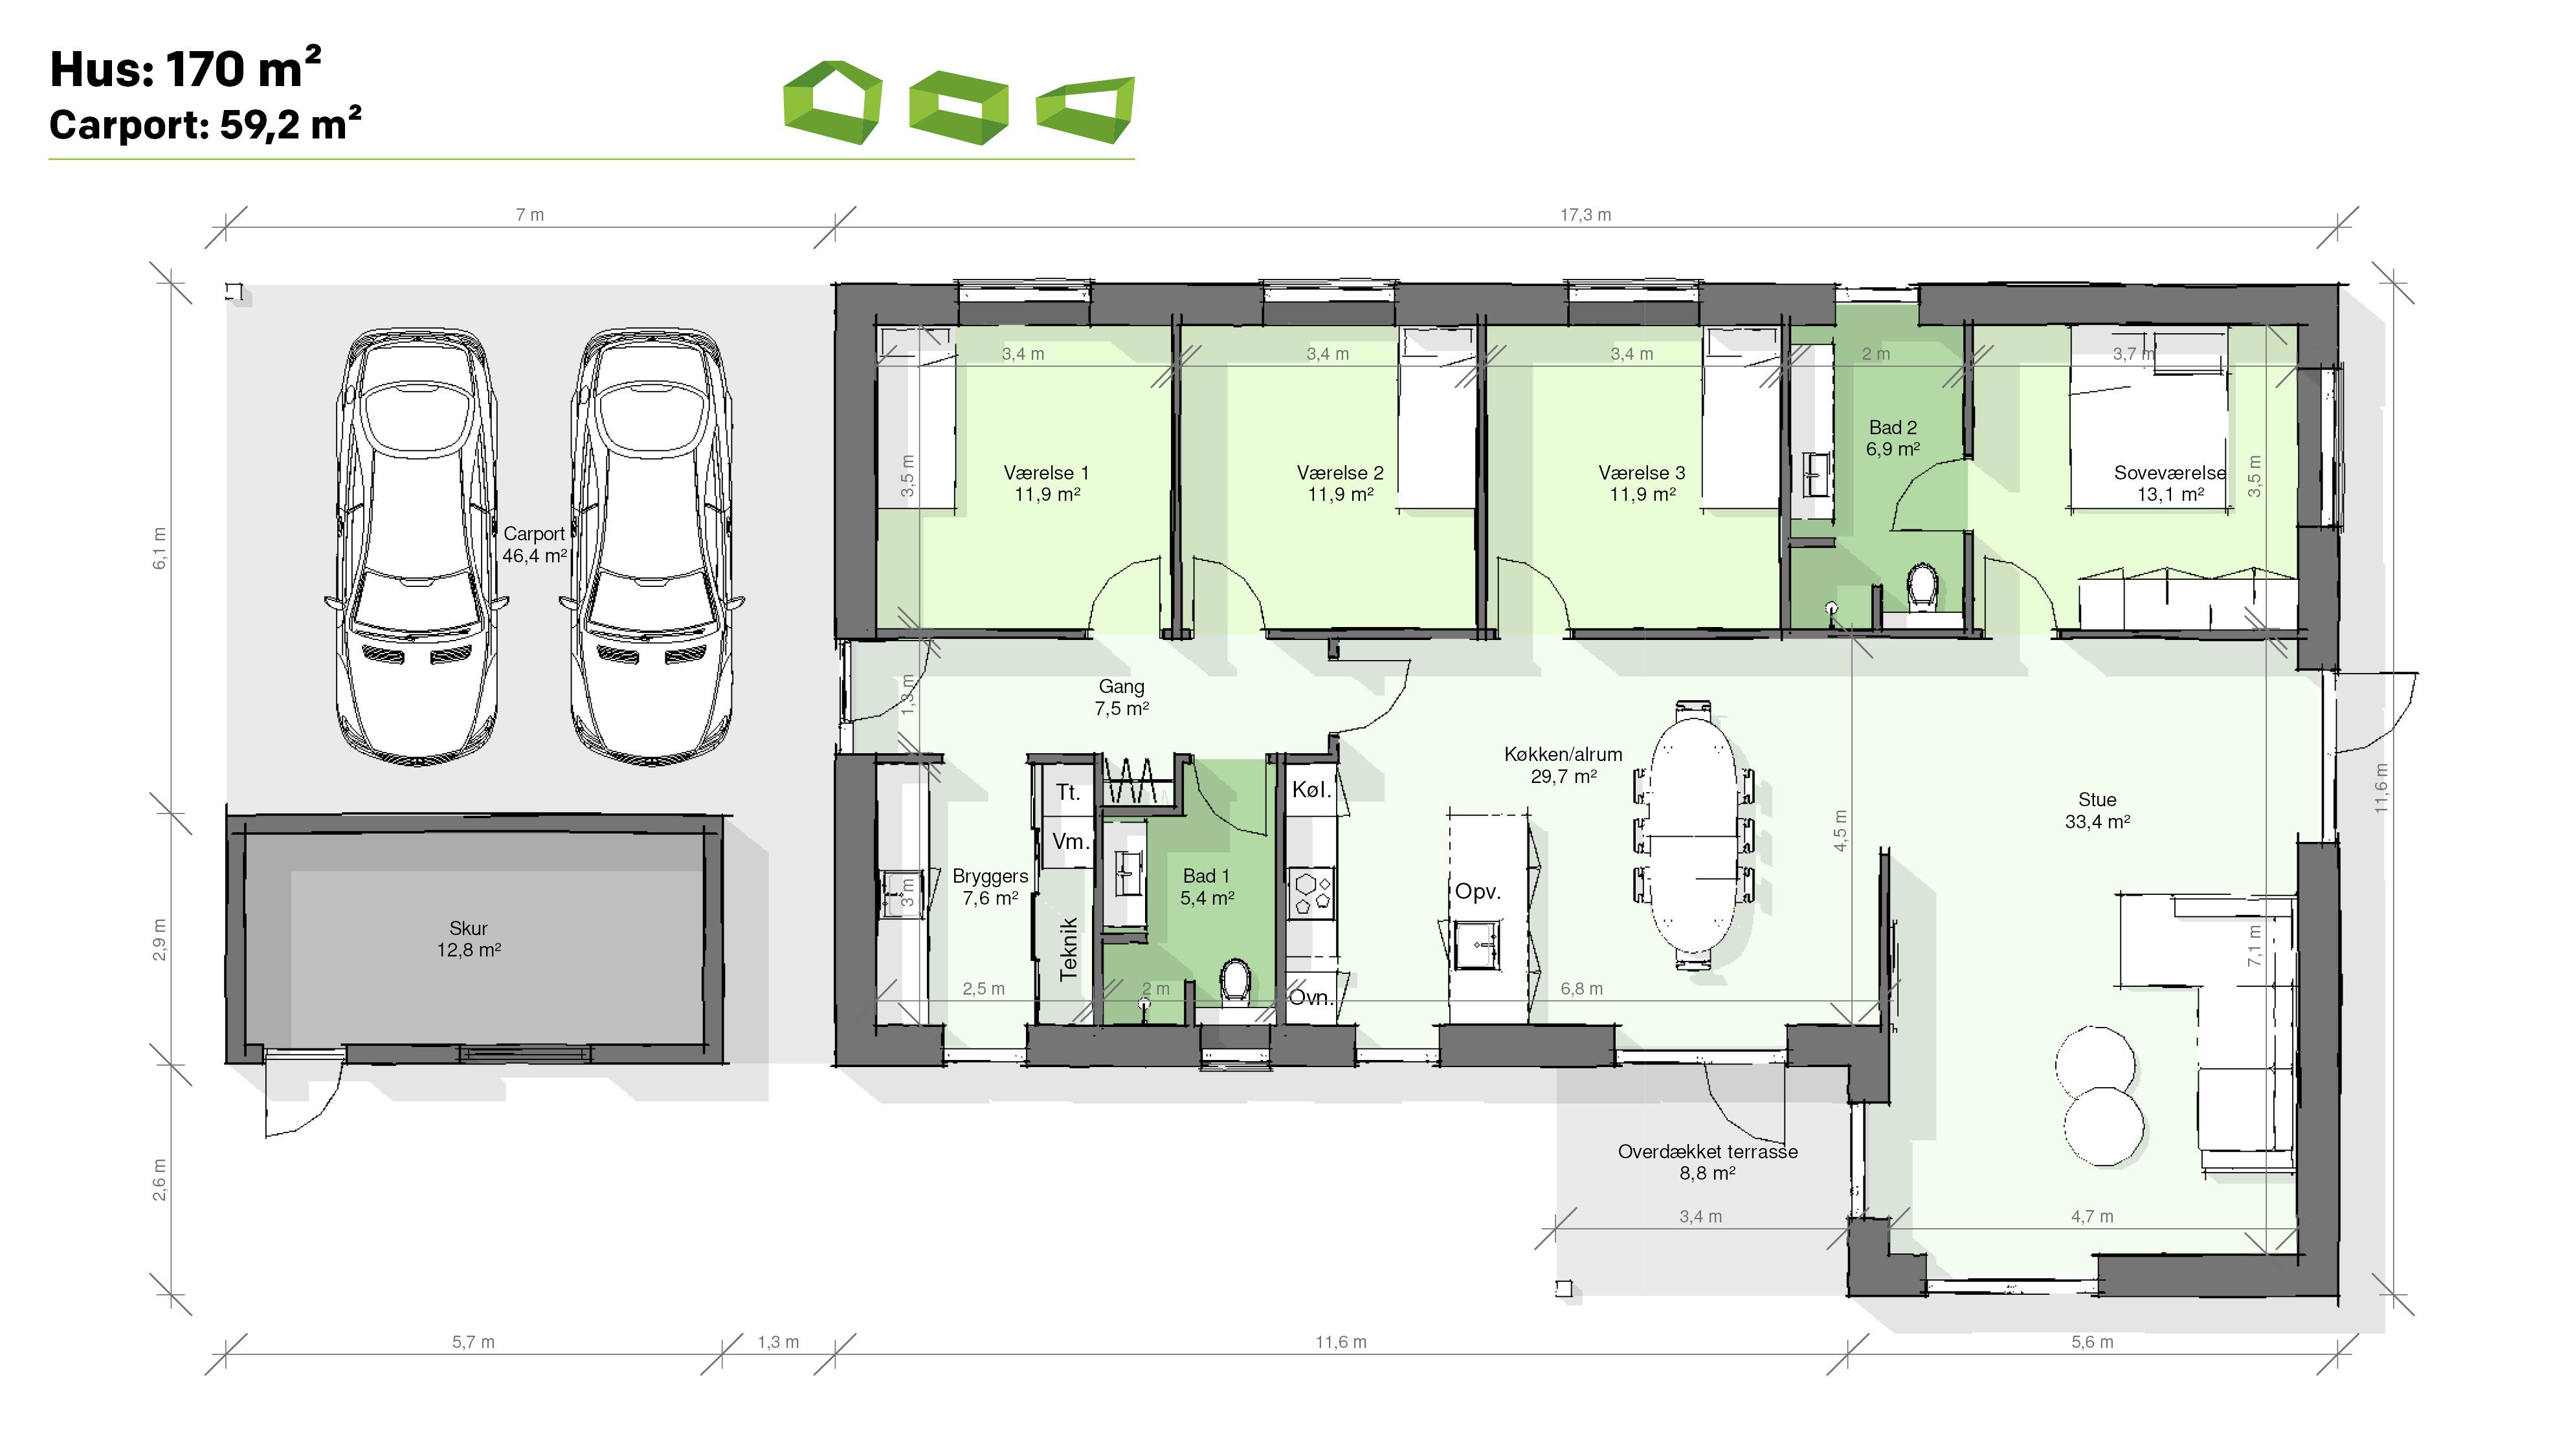 plantegning vinkelhus 170 m2